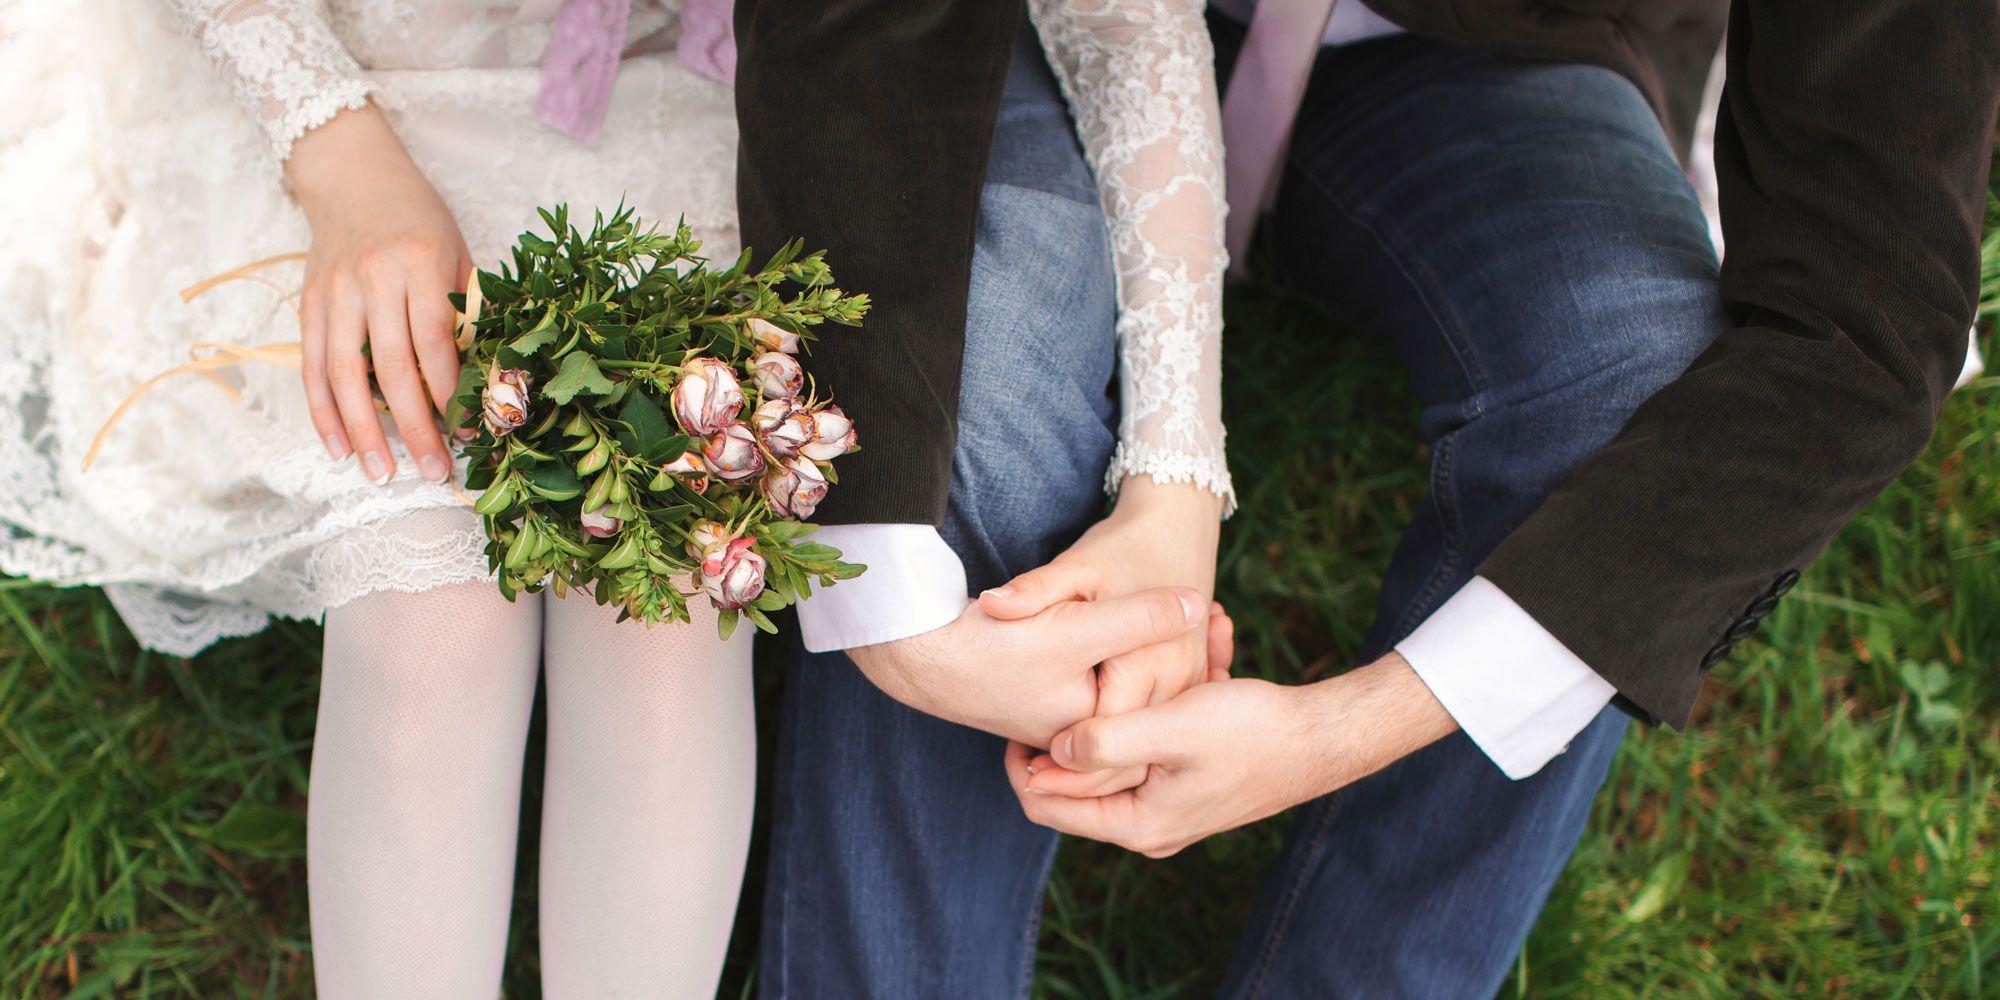 arranged marriage dating websites